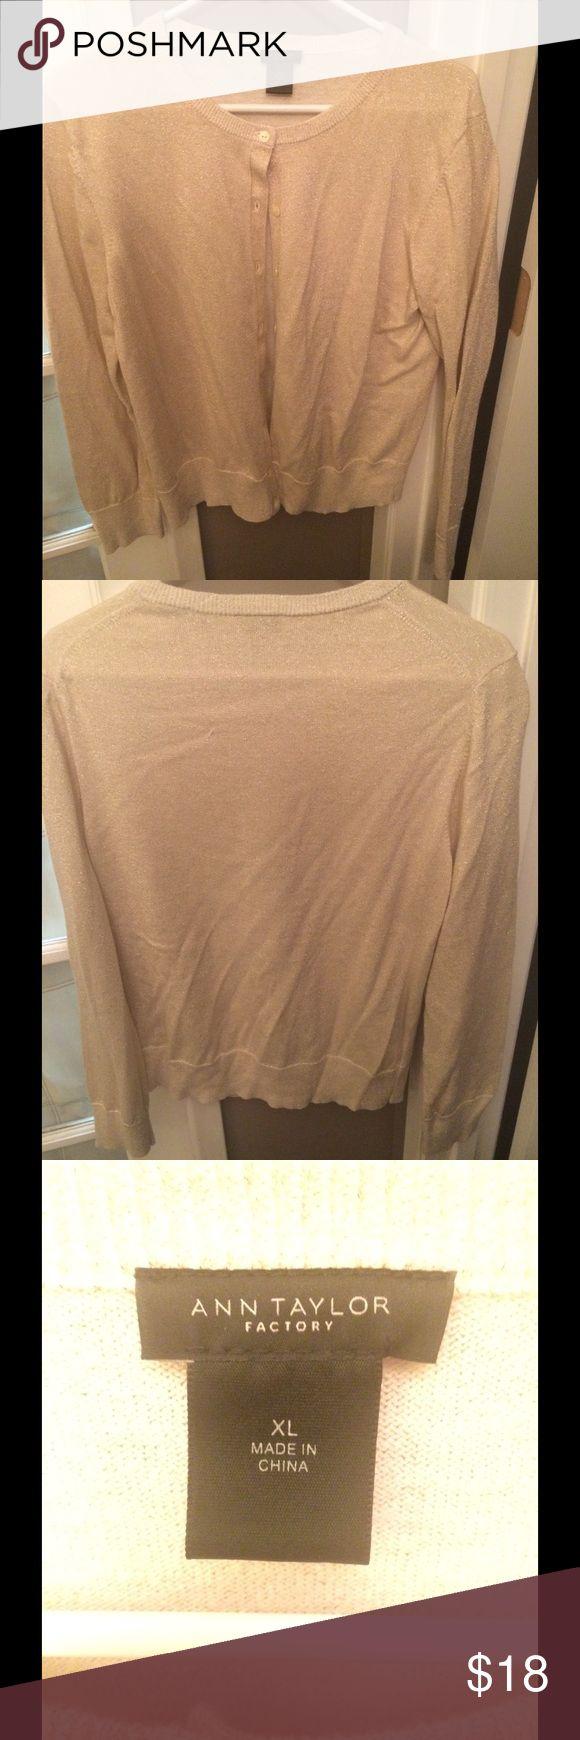 Ann Taylor Gold Cardigan (size XL) Ann Taylor Gold Cardigan (size XL); never been worn and in great condition👍👍 Ann Taylor Sweaters Cardigans